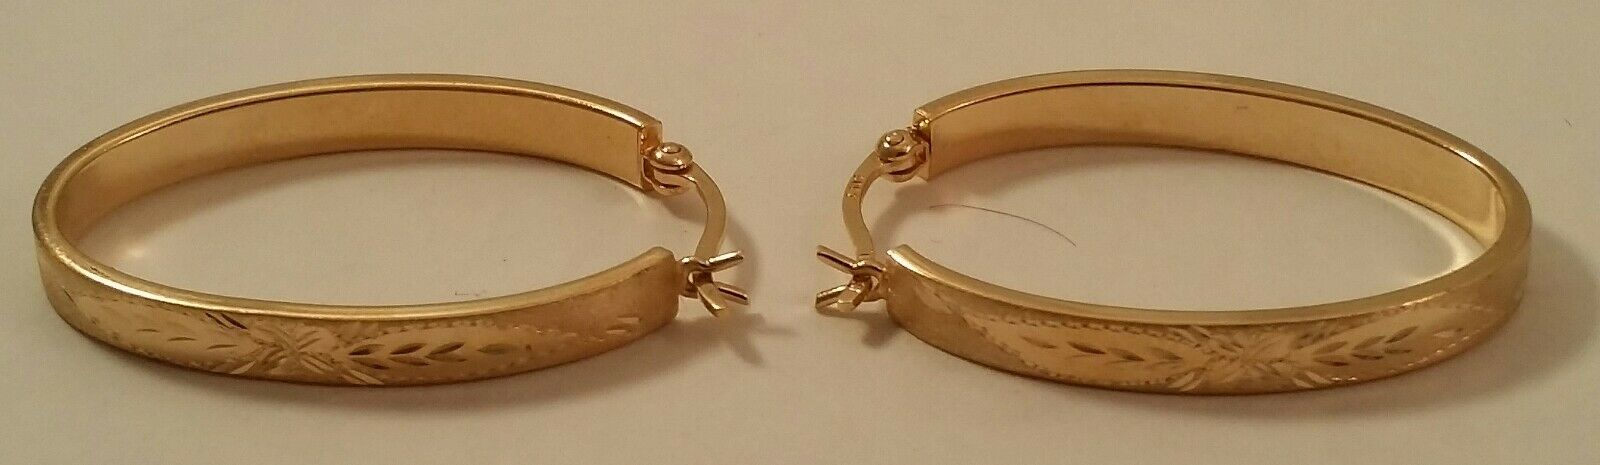 Elongated 14k gold Diamond Cut Hoop Earrings